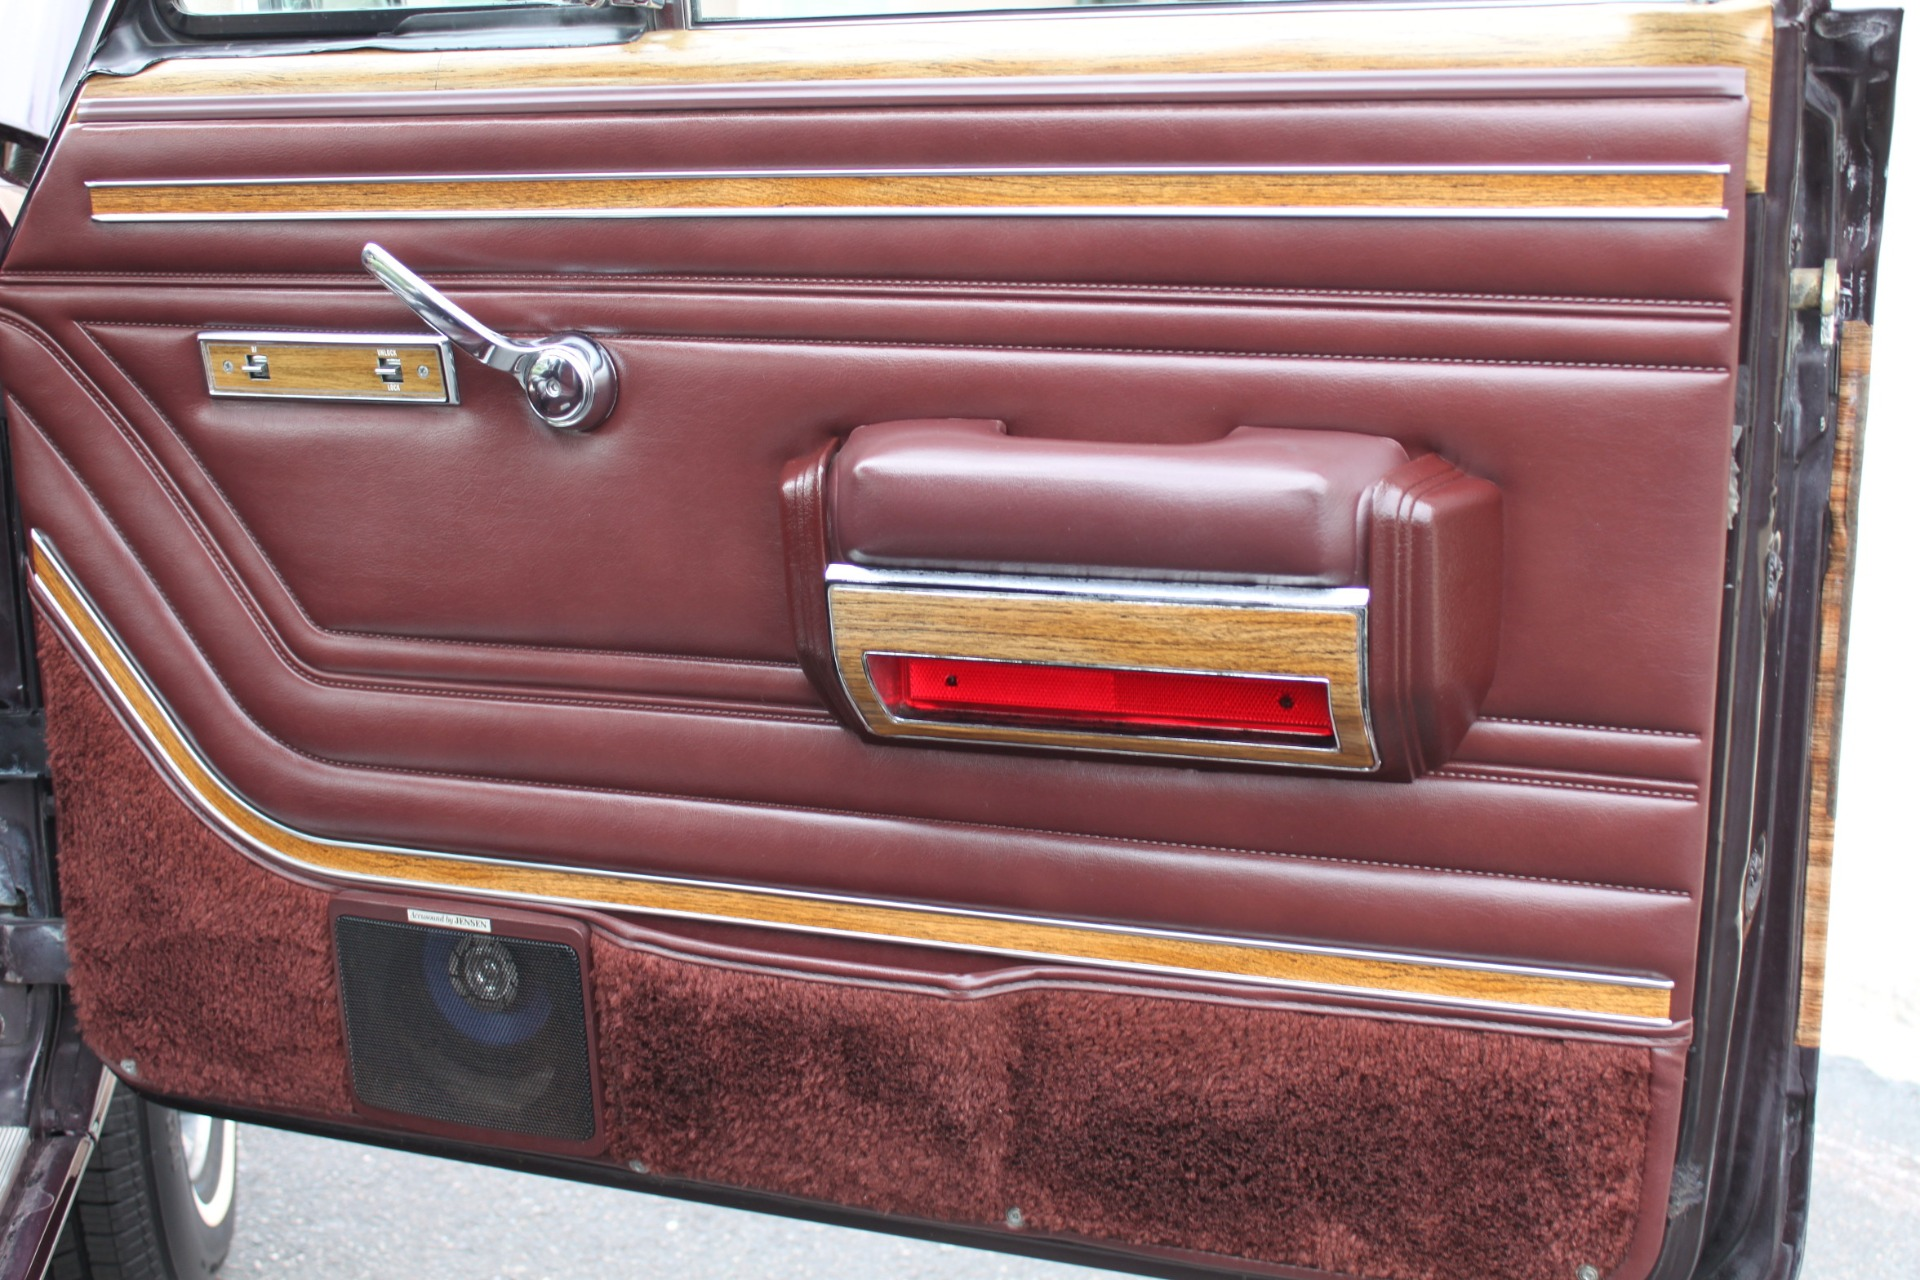 Used-1989-Jeep-Grand-Wagoneer-Mopar